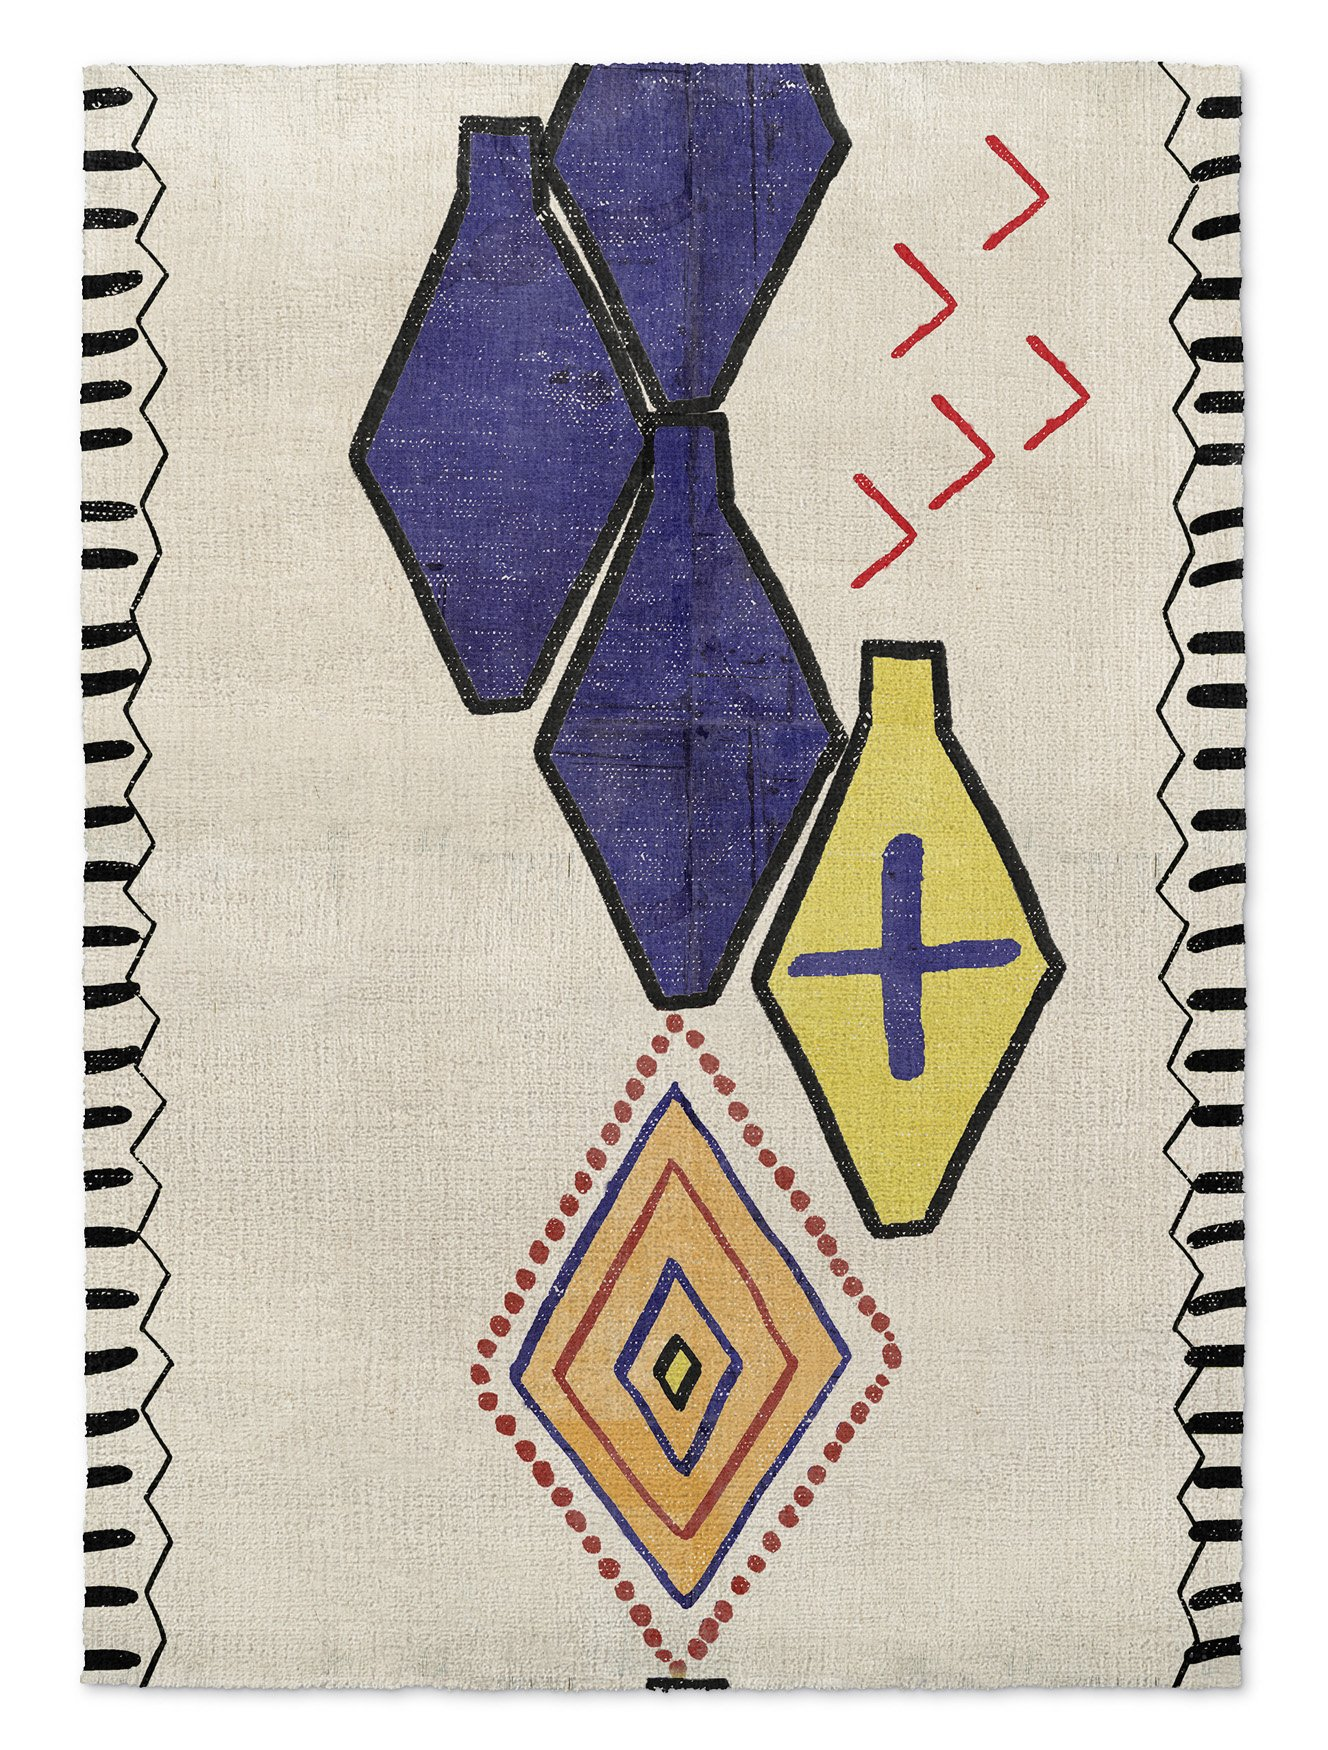 KAVKA Designs Bousslama Area Rug, (Red/Blue/Orange/Ivory) - NAVAJO Collection, Size: 5x7x.5 - (TELAVC8095RUG57)